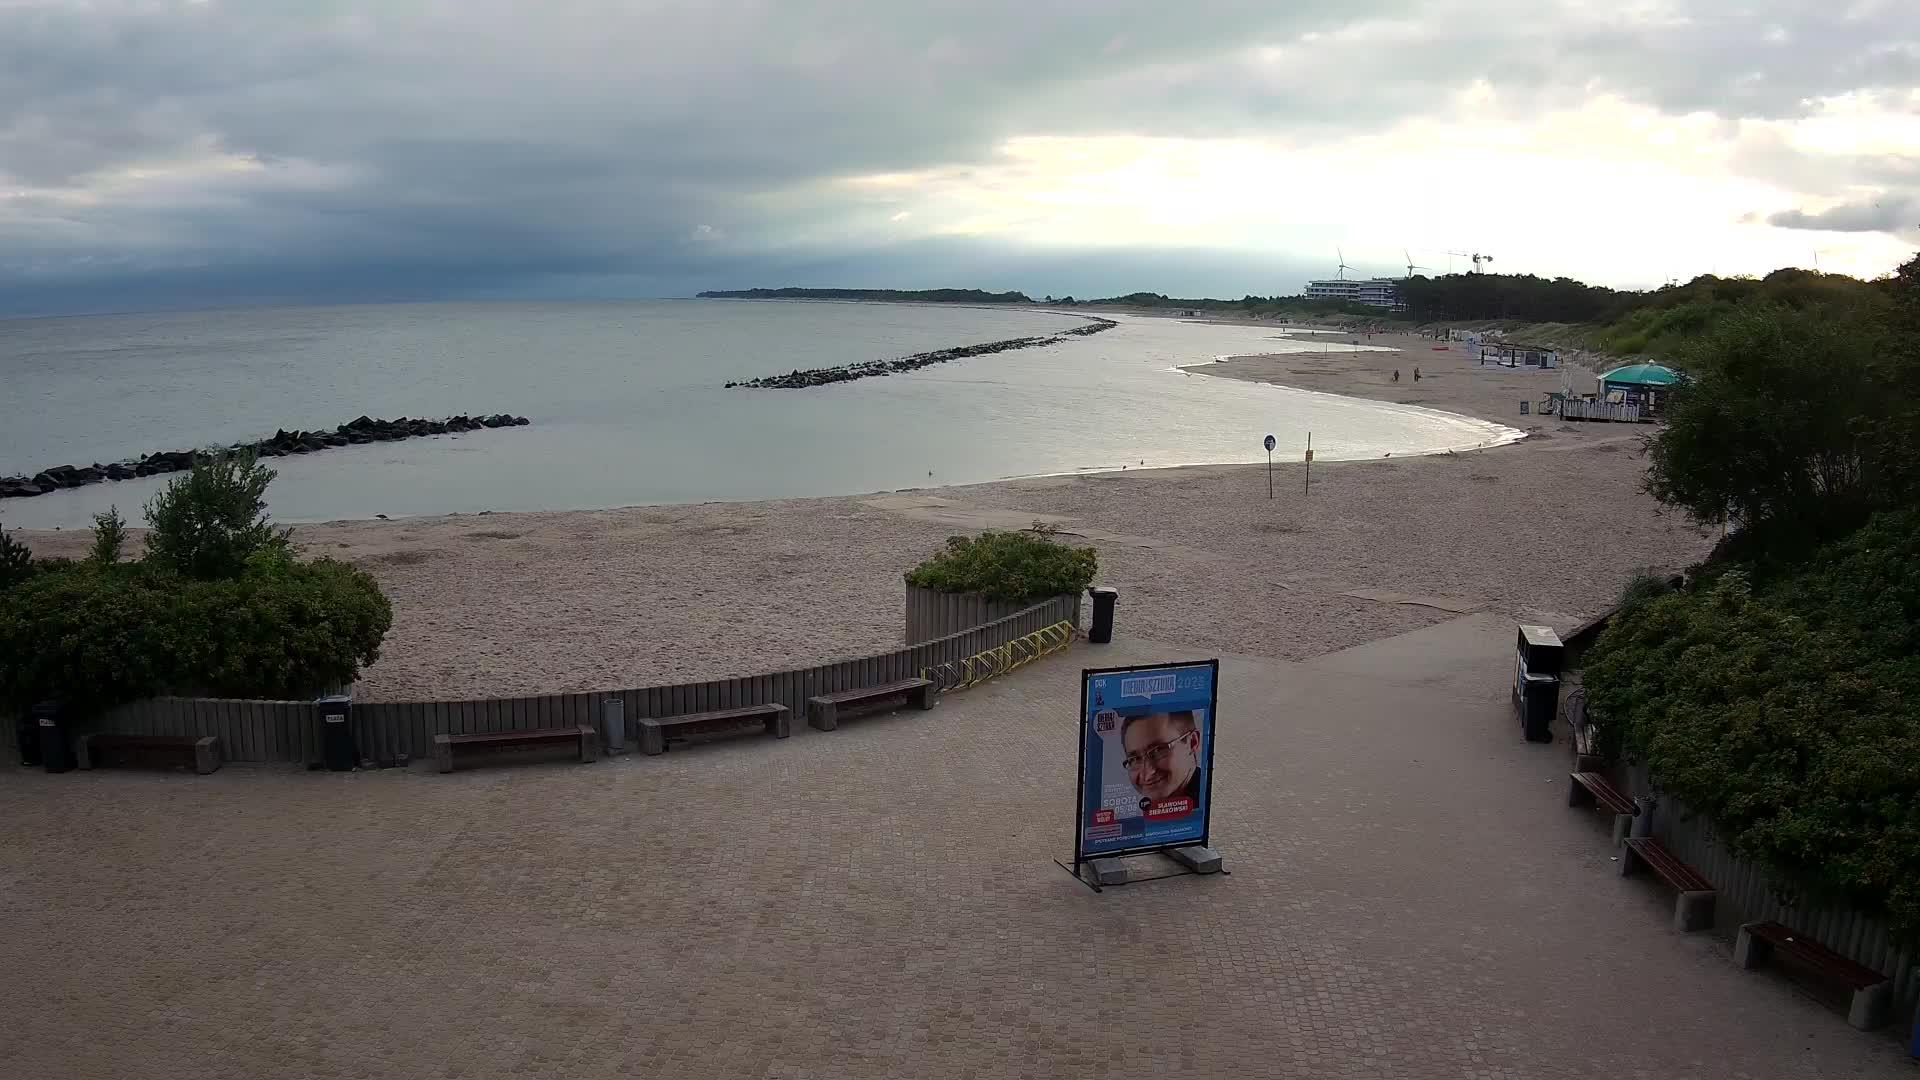 Darłówko: HD-Strandpanorama - Webcam Galore